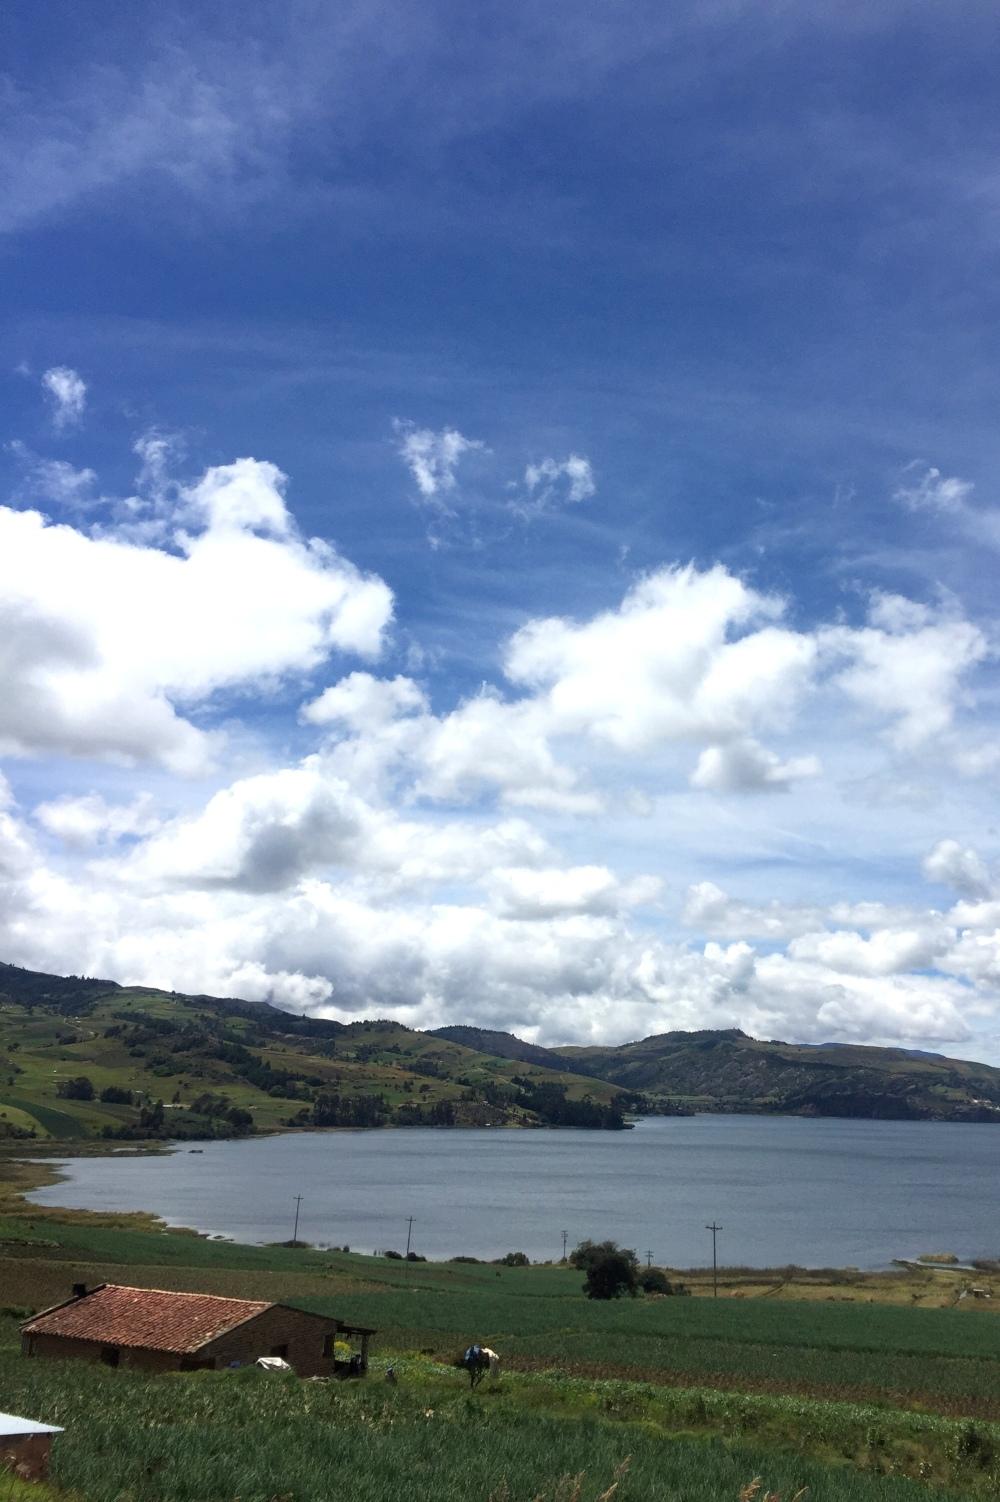 laguna-de-tota-boyaca-colombia-landscape-lake